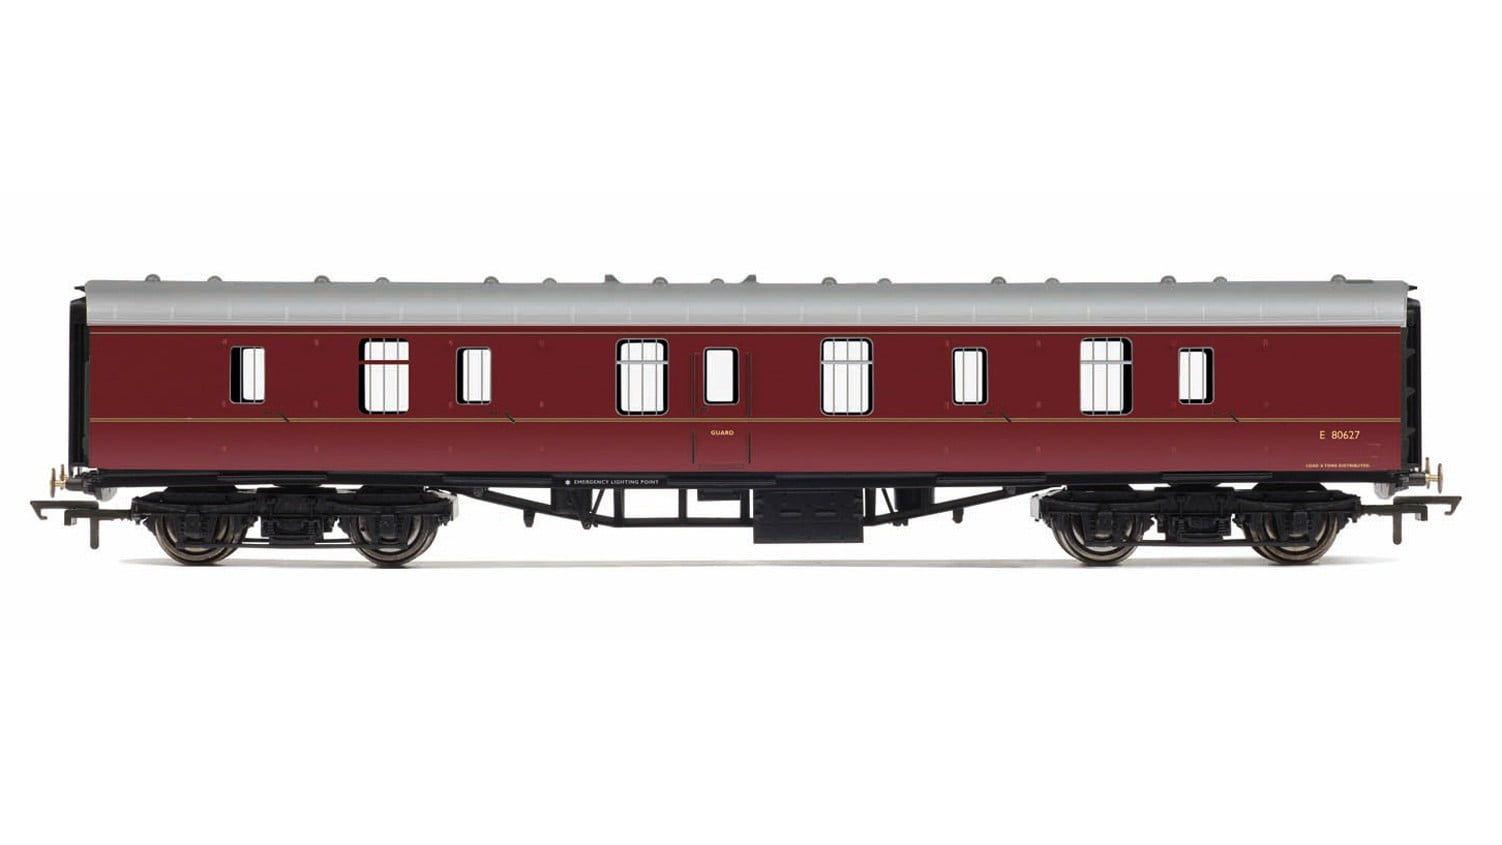 BR, Mk1 Parcels, E80627 - Era 5